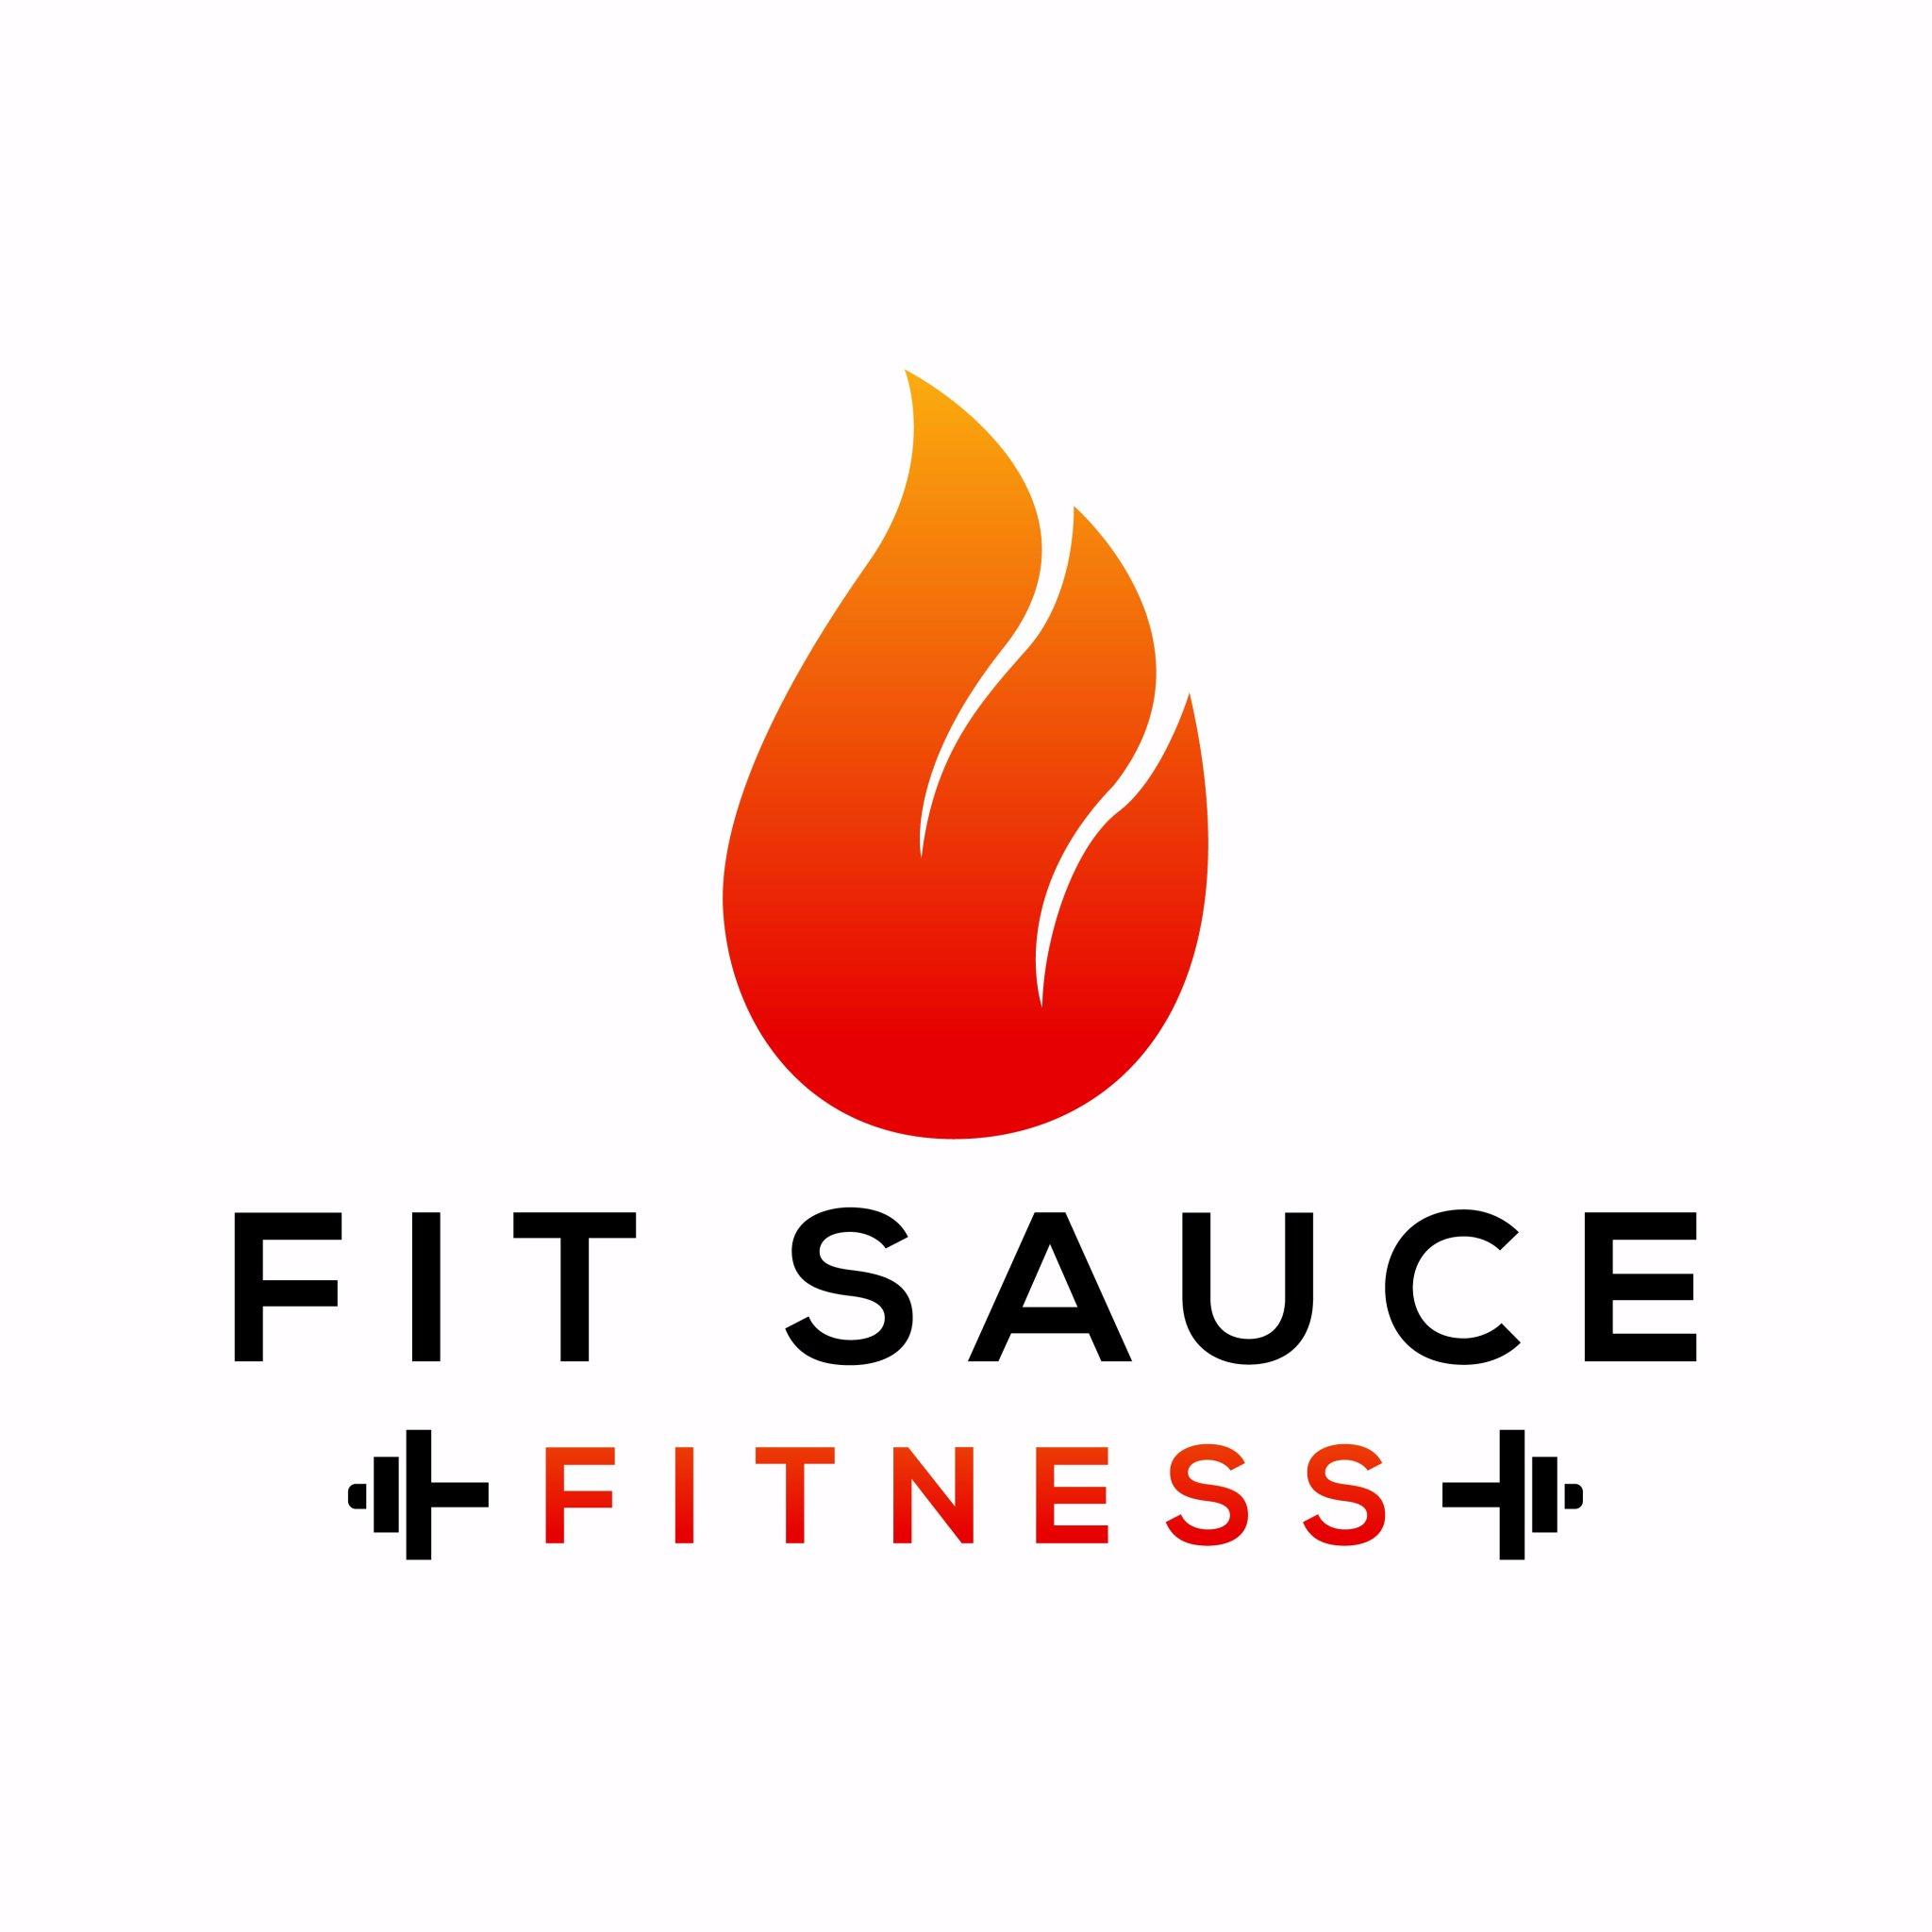 FitSauce Fitness